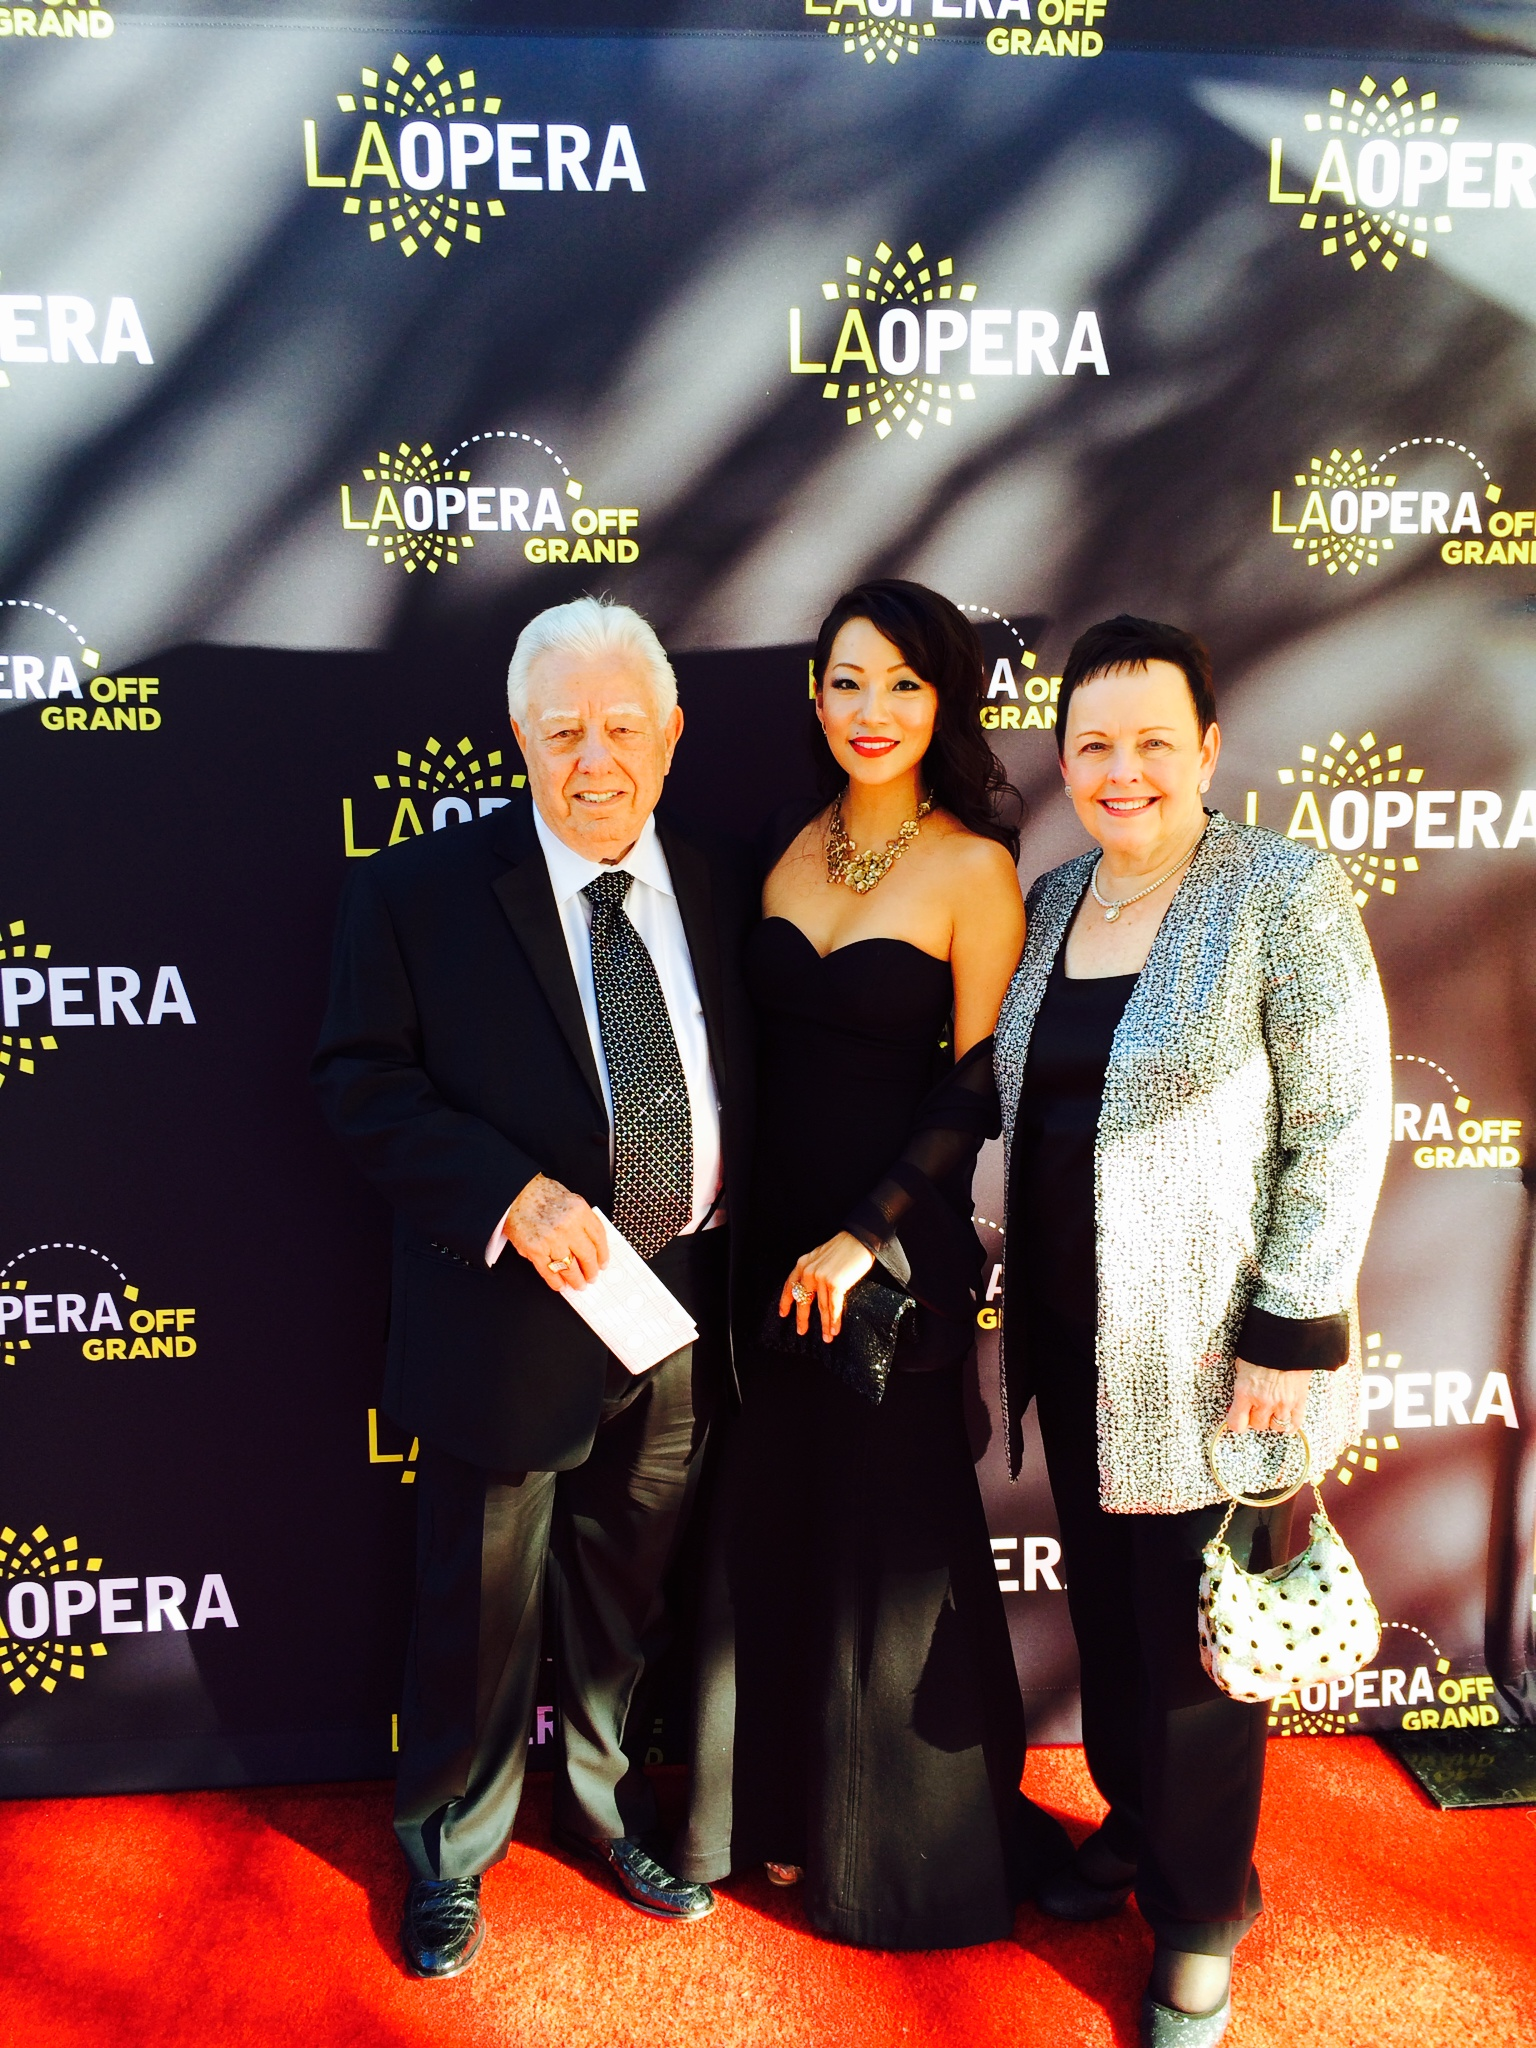 With dear Paul and Marybelle Musco